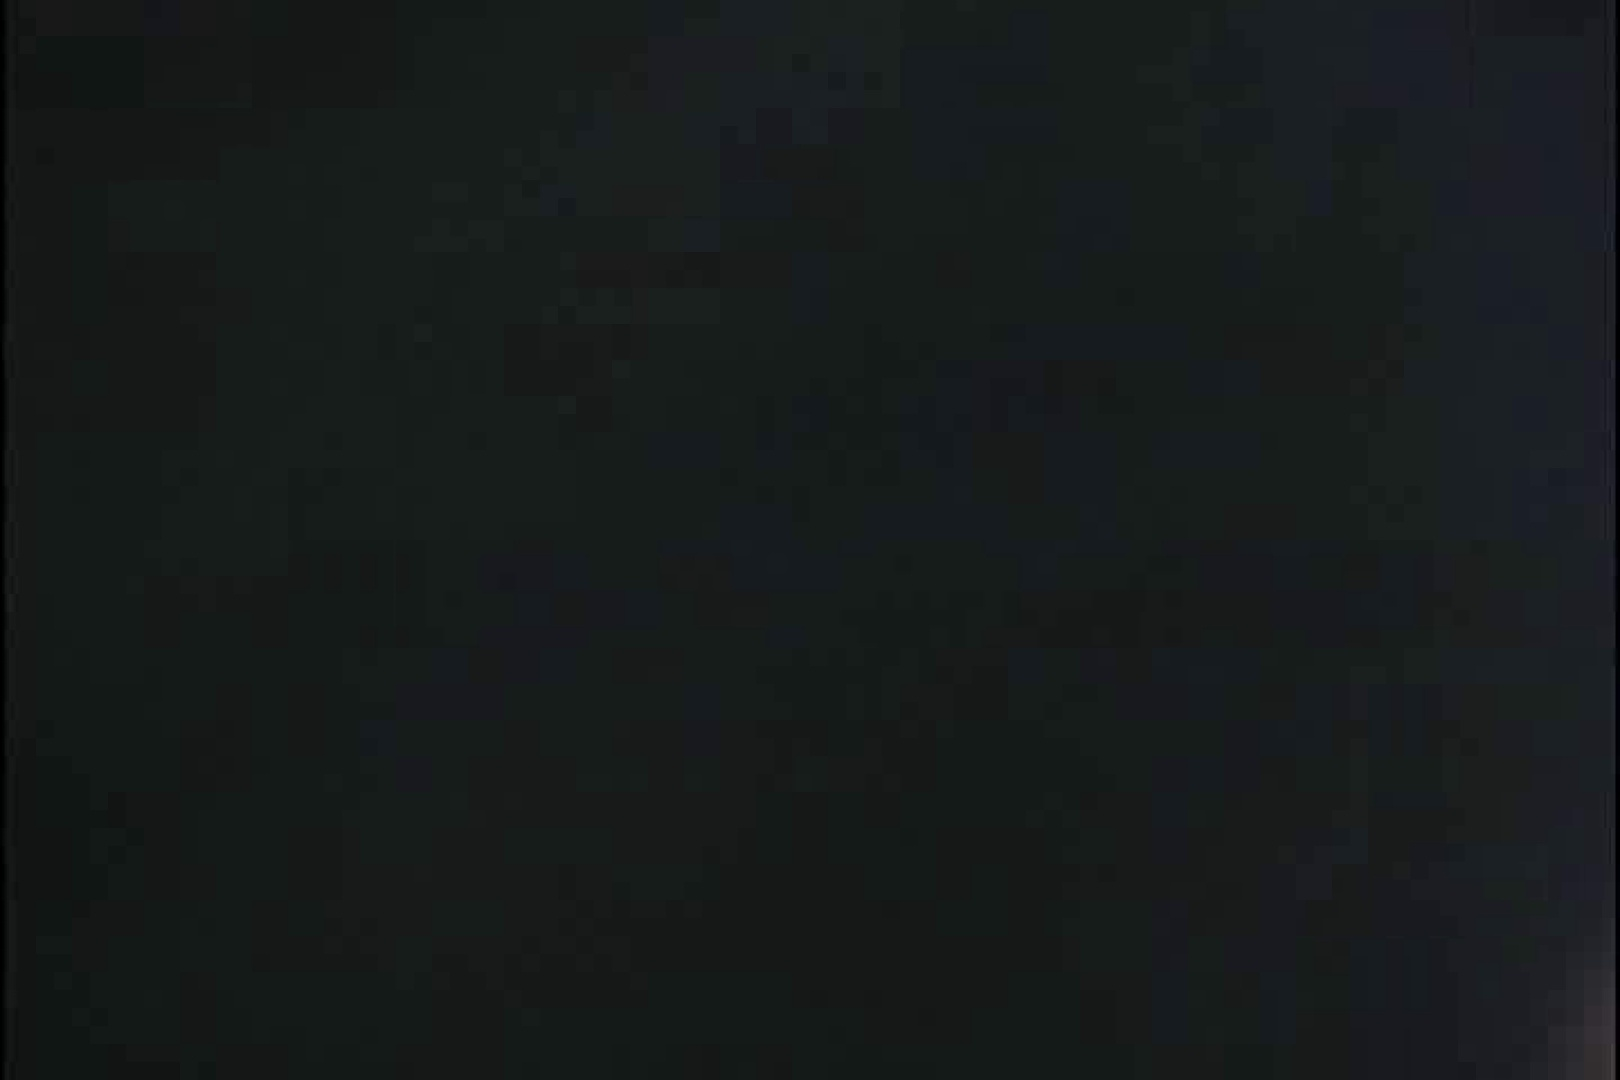 RQカメラ地獄Vol.13 ぱっくり下半身  95画像 95